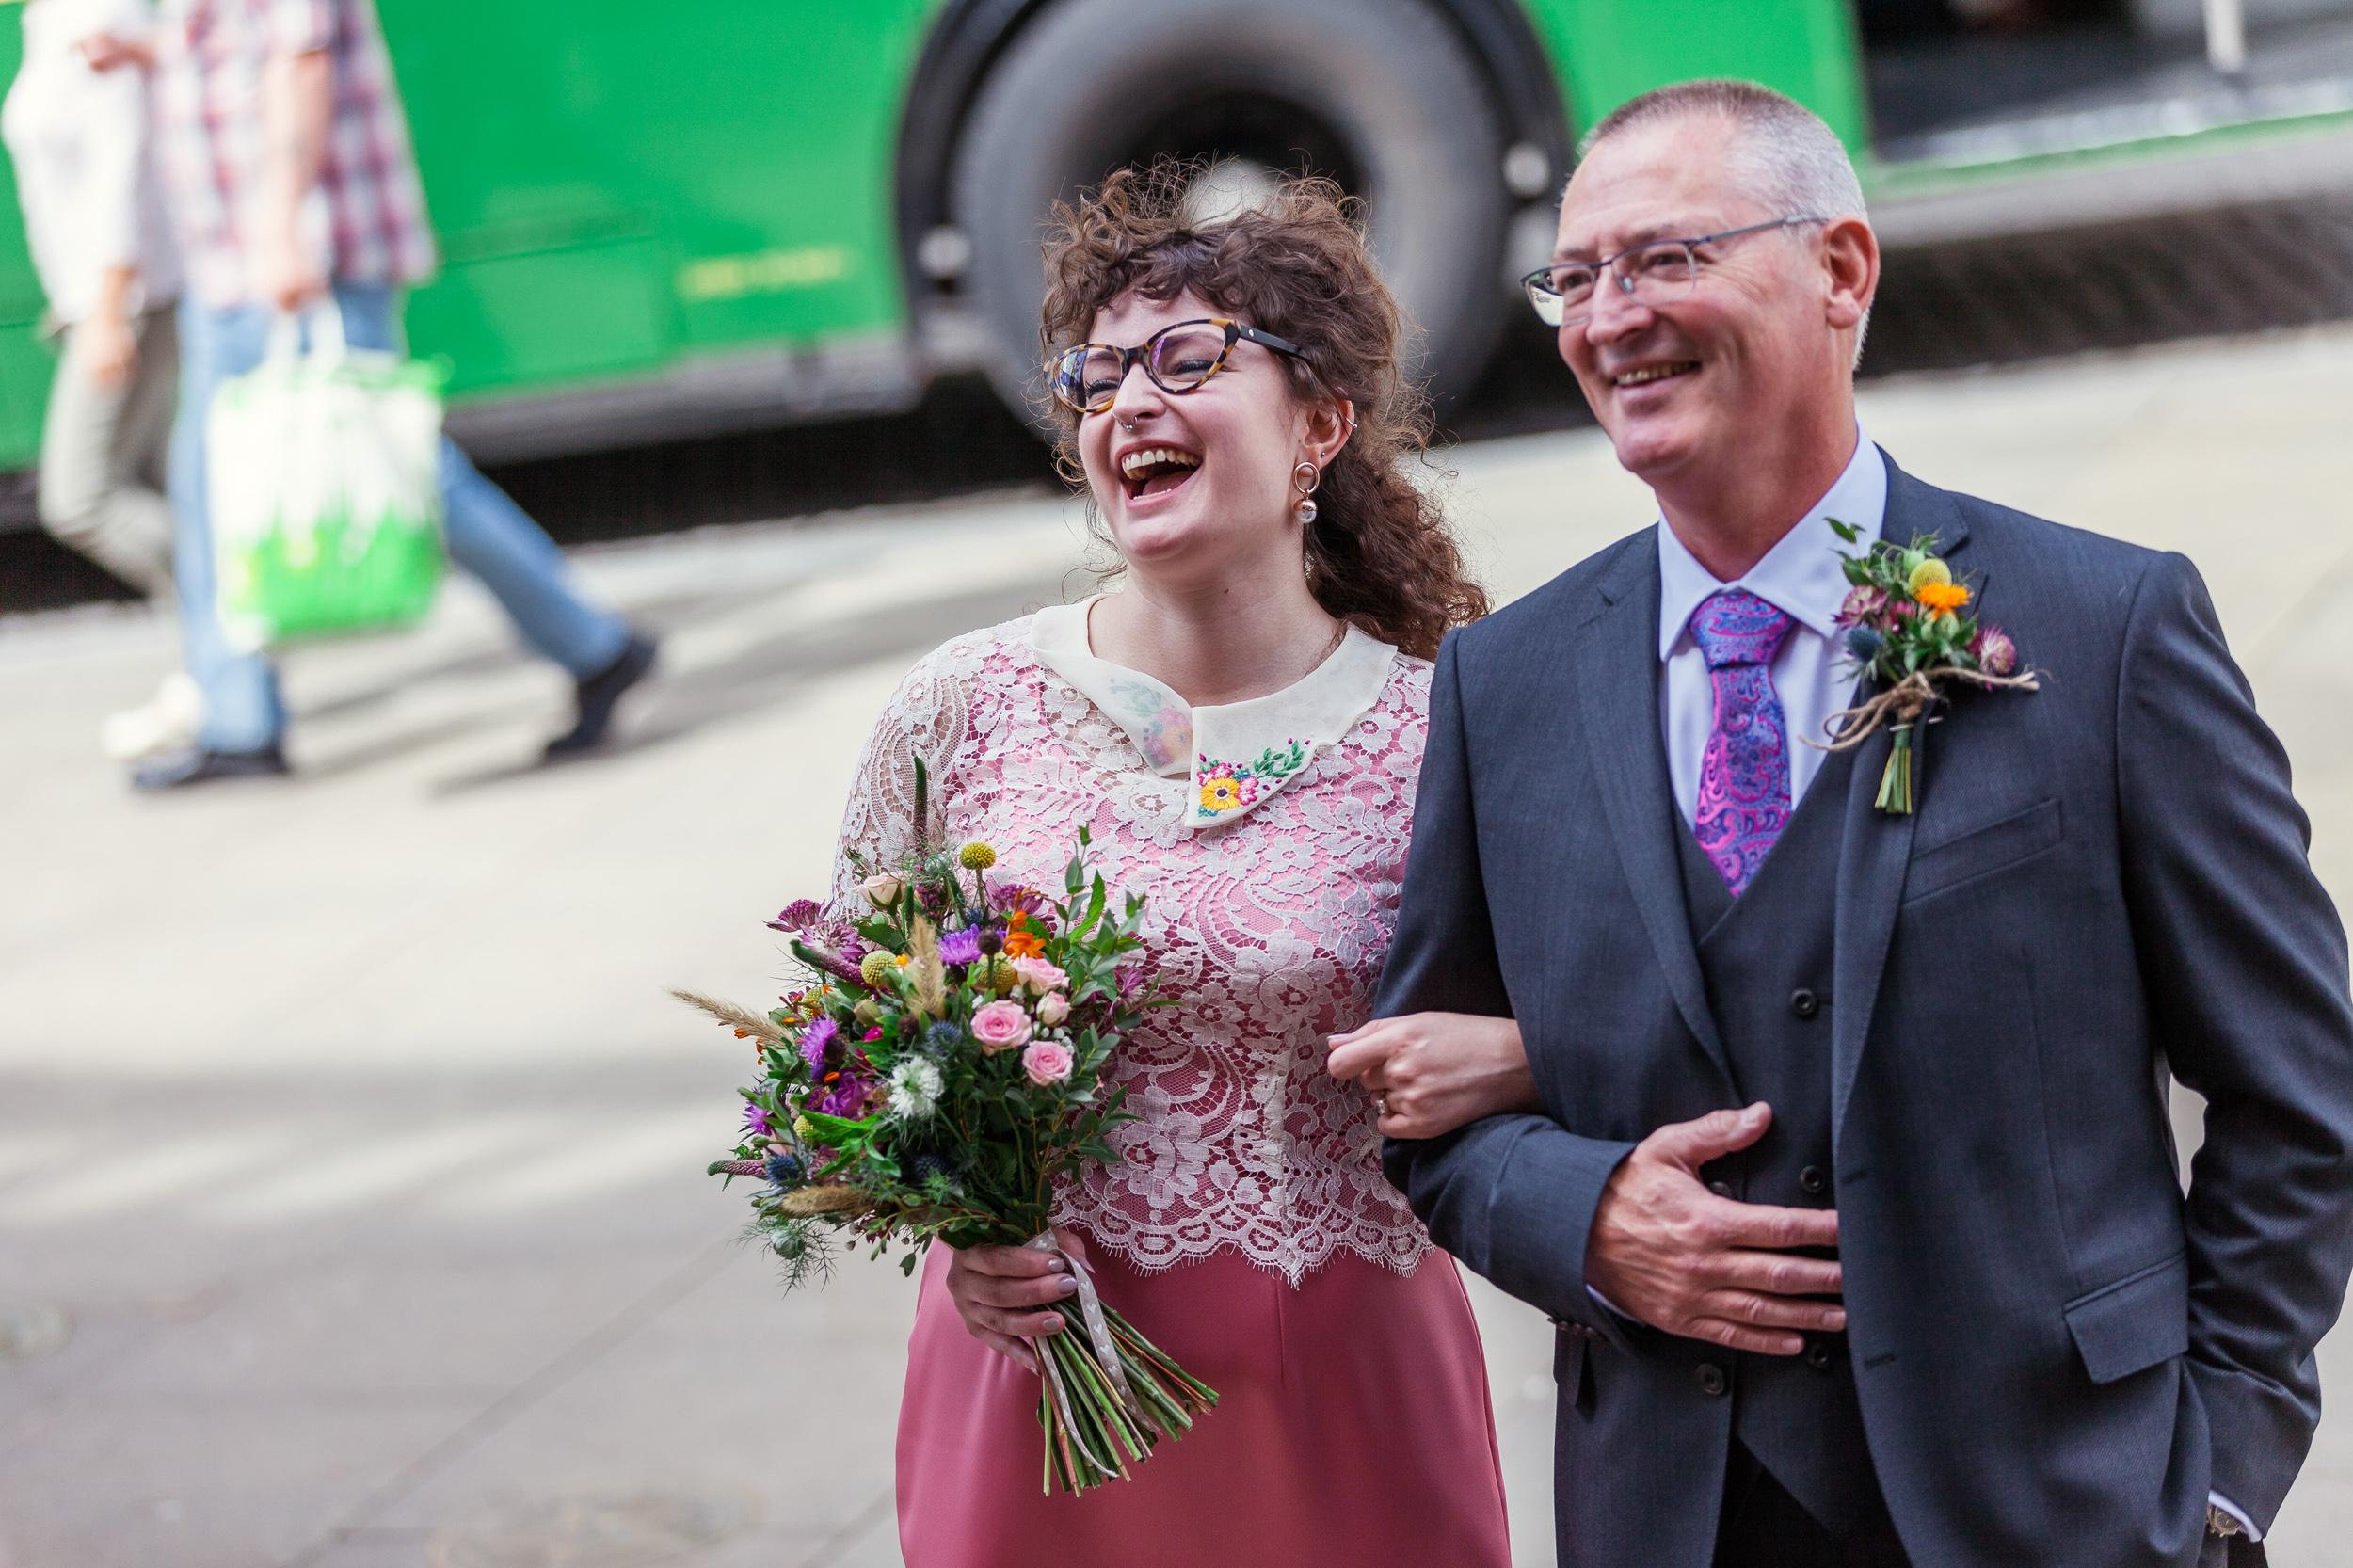 Emma-Coloured-Wedding-Dress-Sheffield-Kate-Beaumont-1.jpg